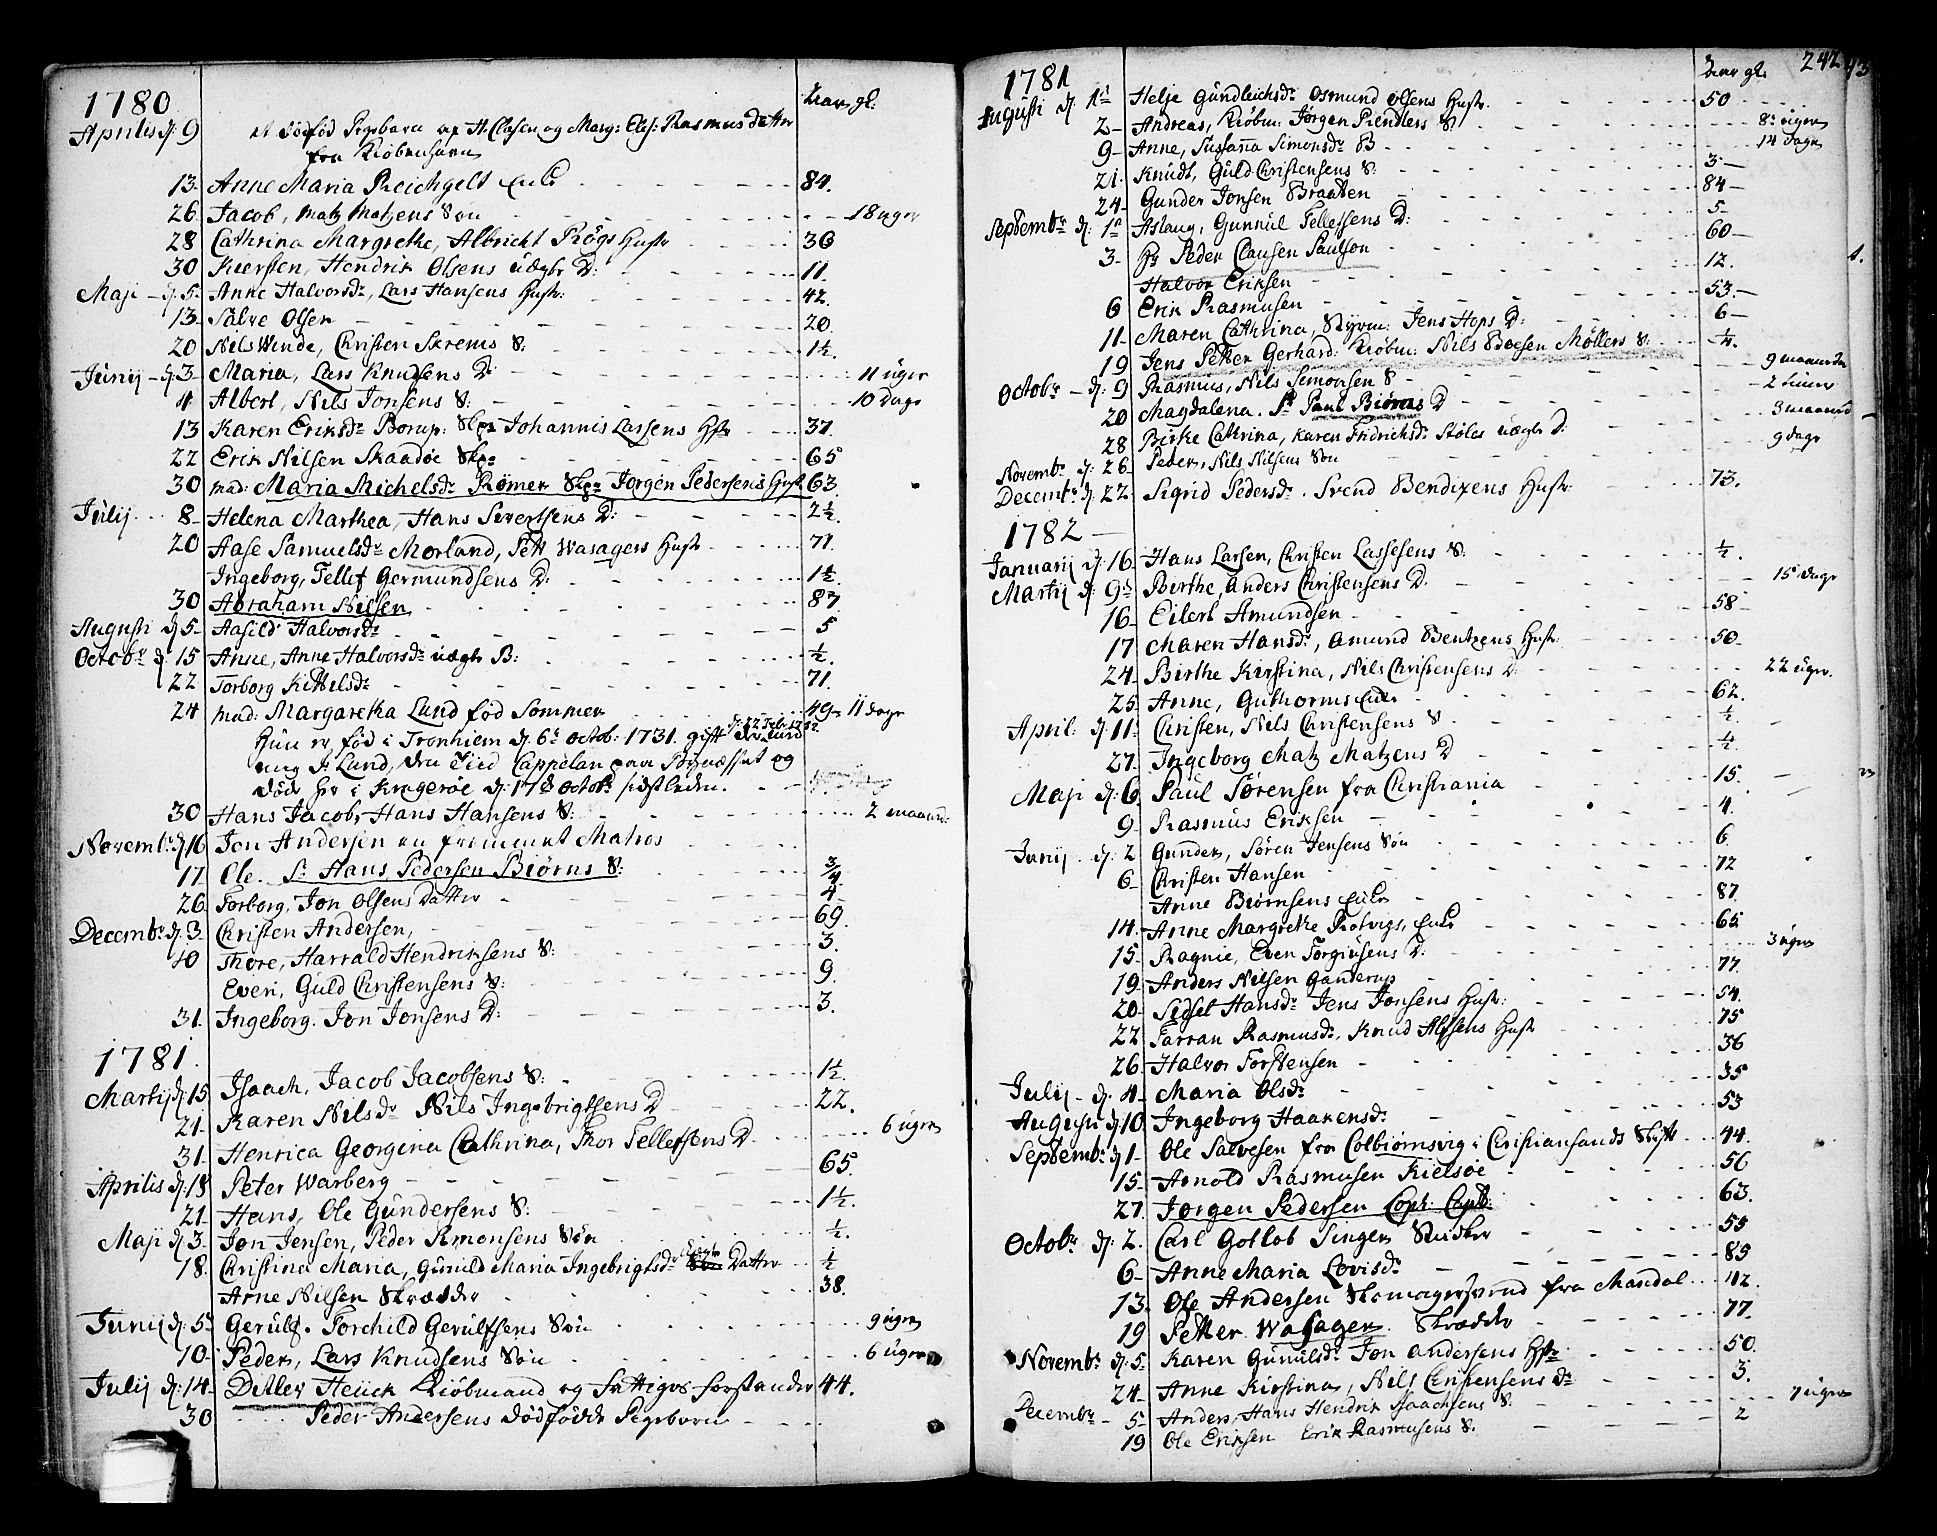 SAKO, Kragerø kirkebøker, F/Fa/L0002: Ministerialbok nr. 2, 1767-1802, s. 242